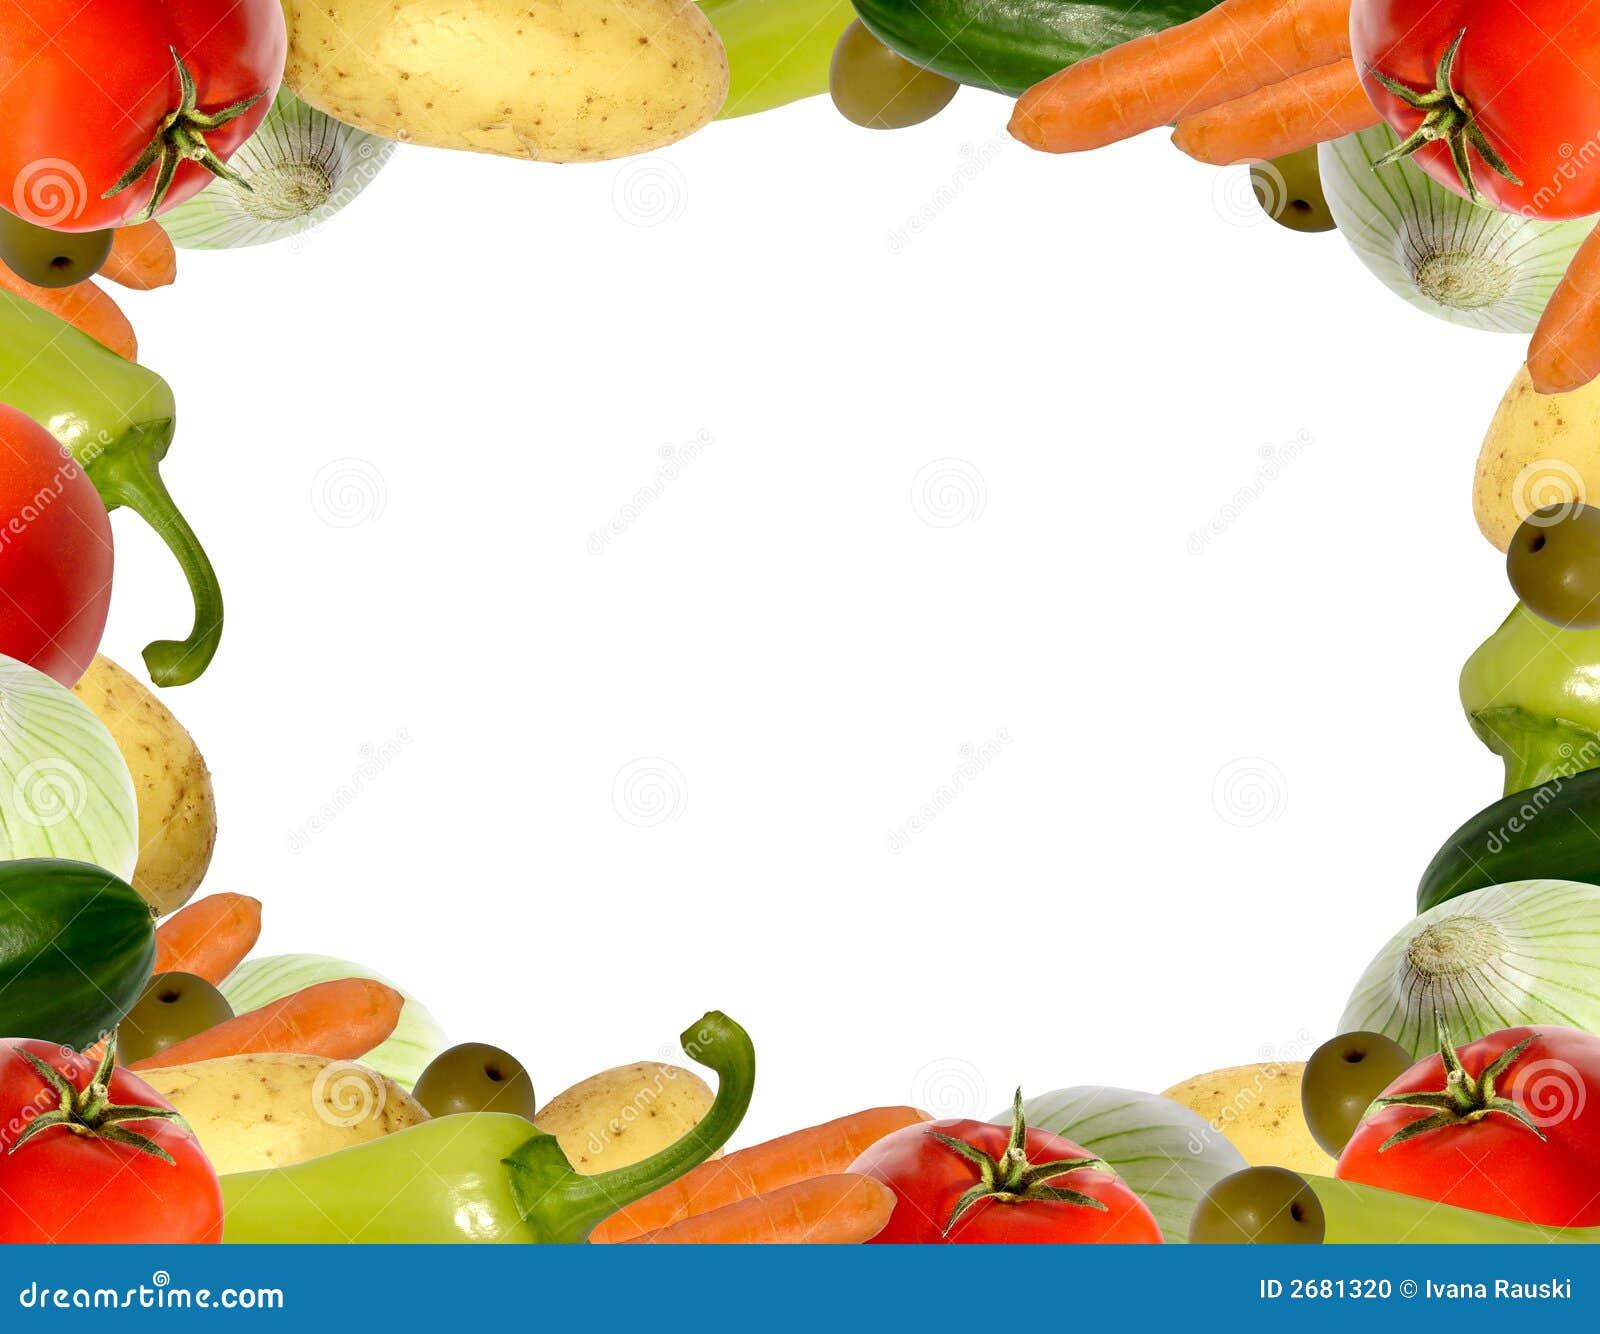 Vegetable Frame Stock Photo - Image: 2681320